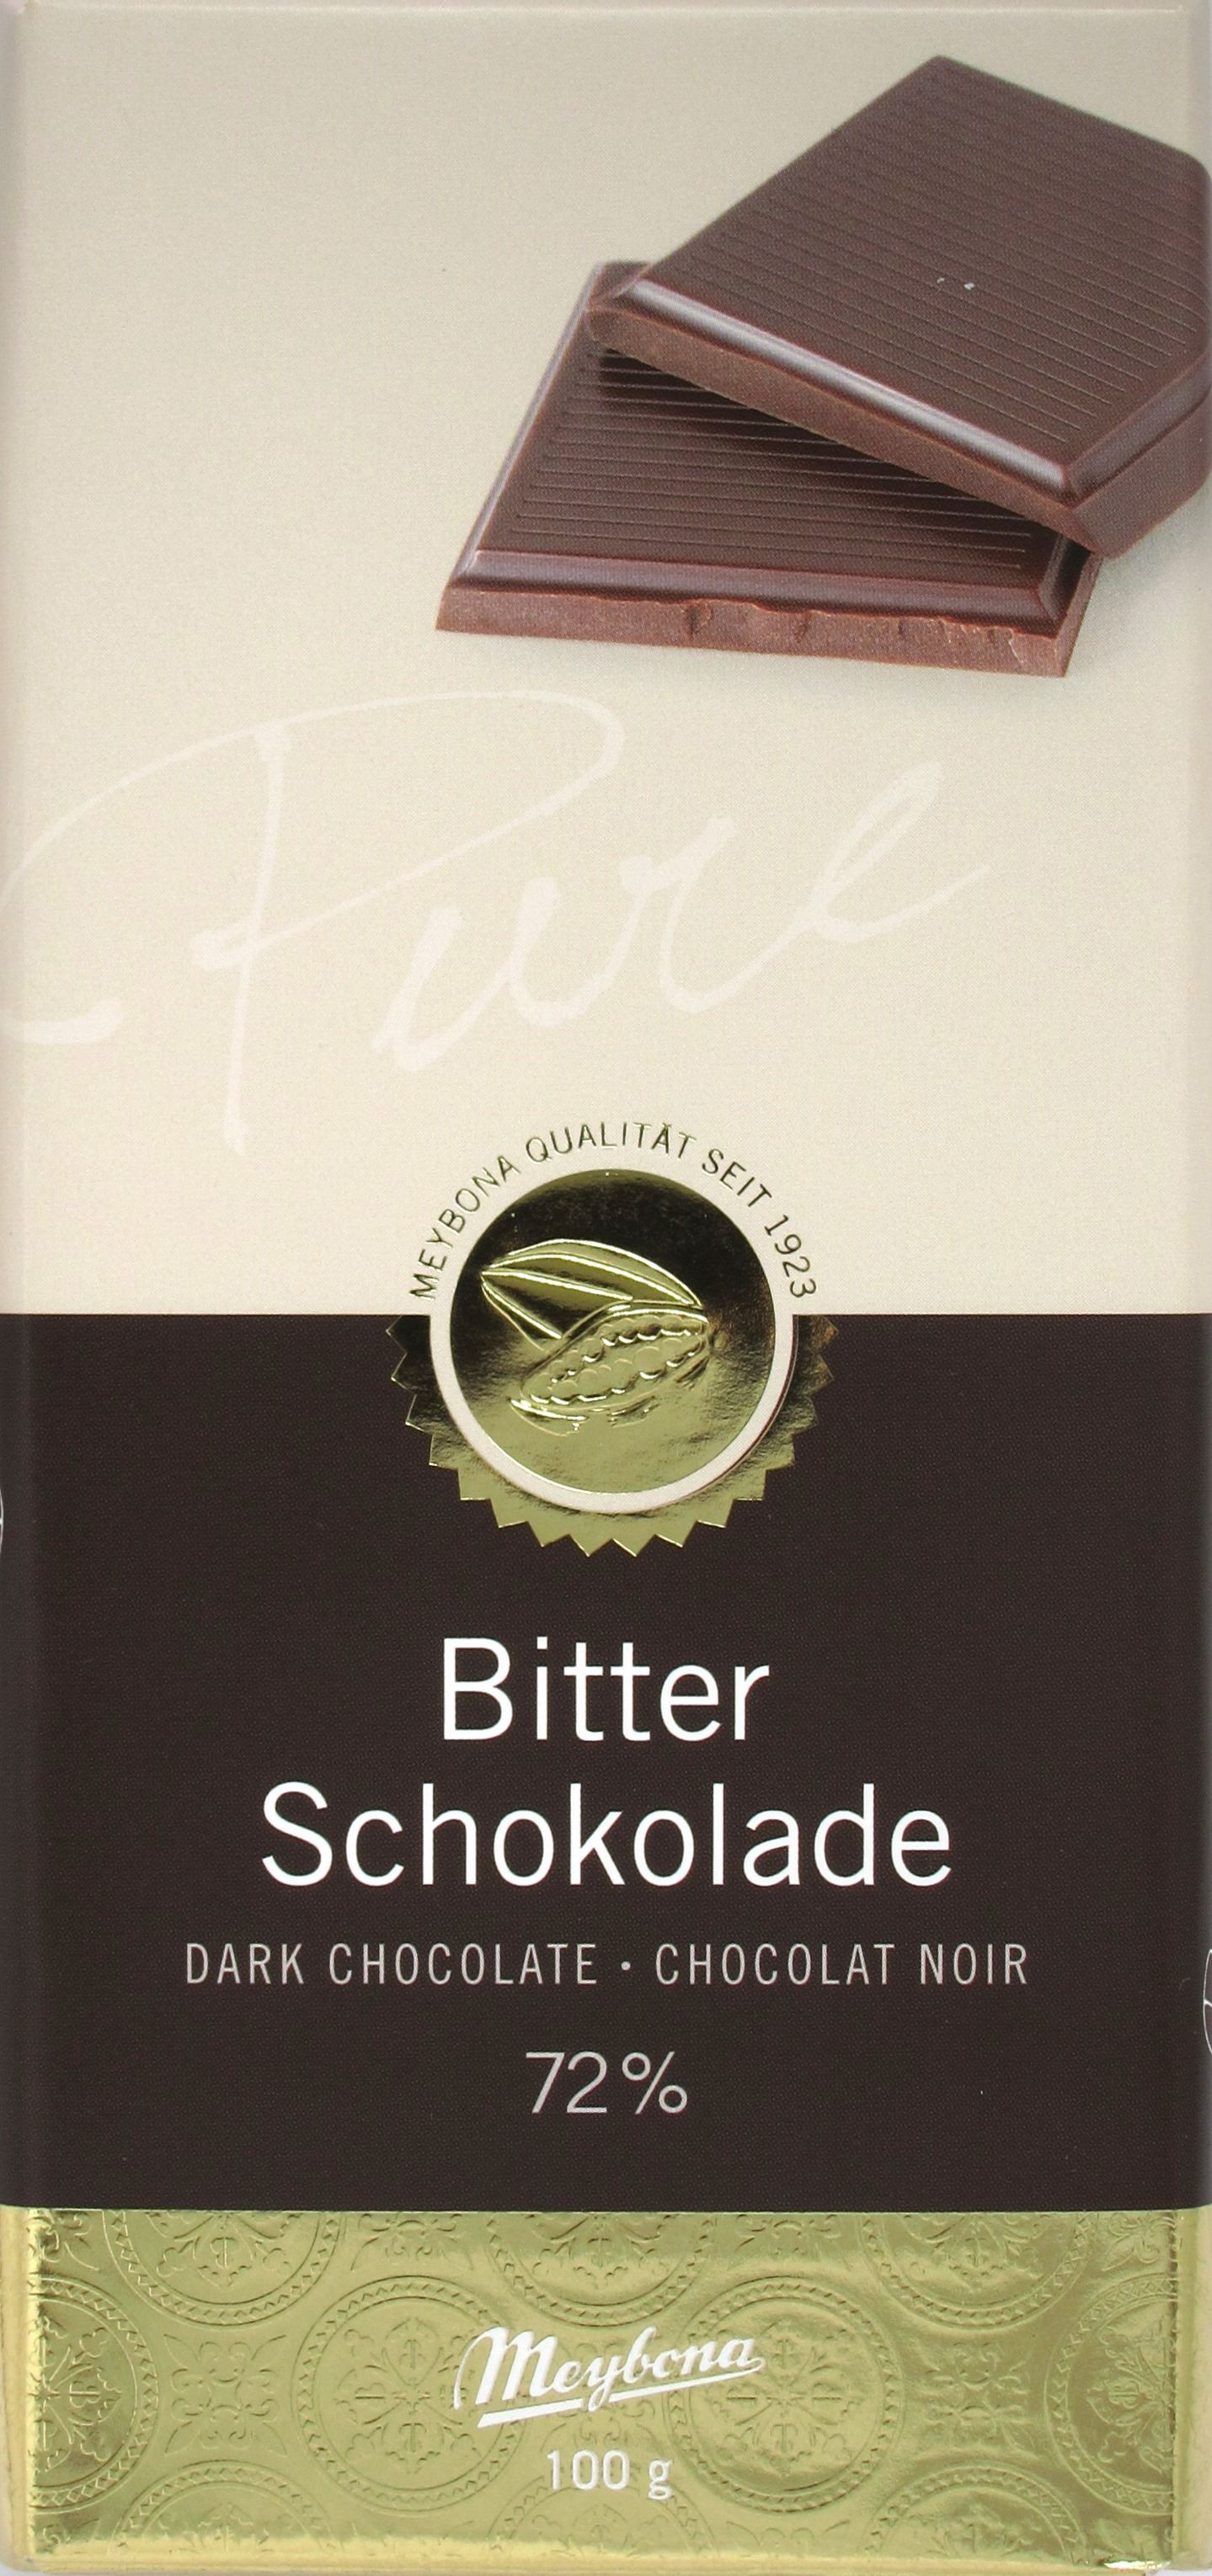 Meybona Bitterschokolade (72%)